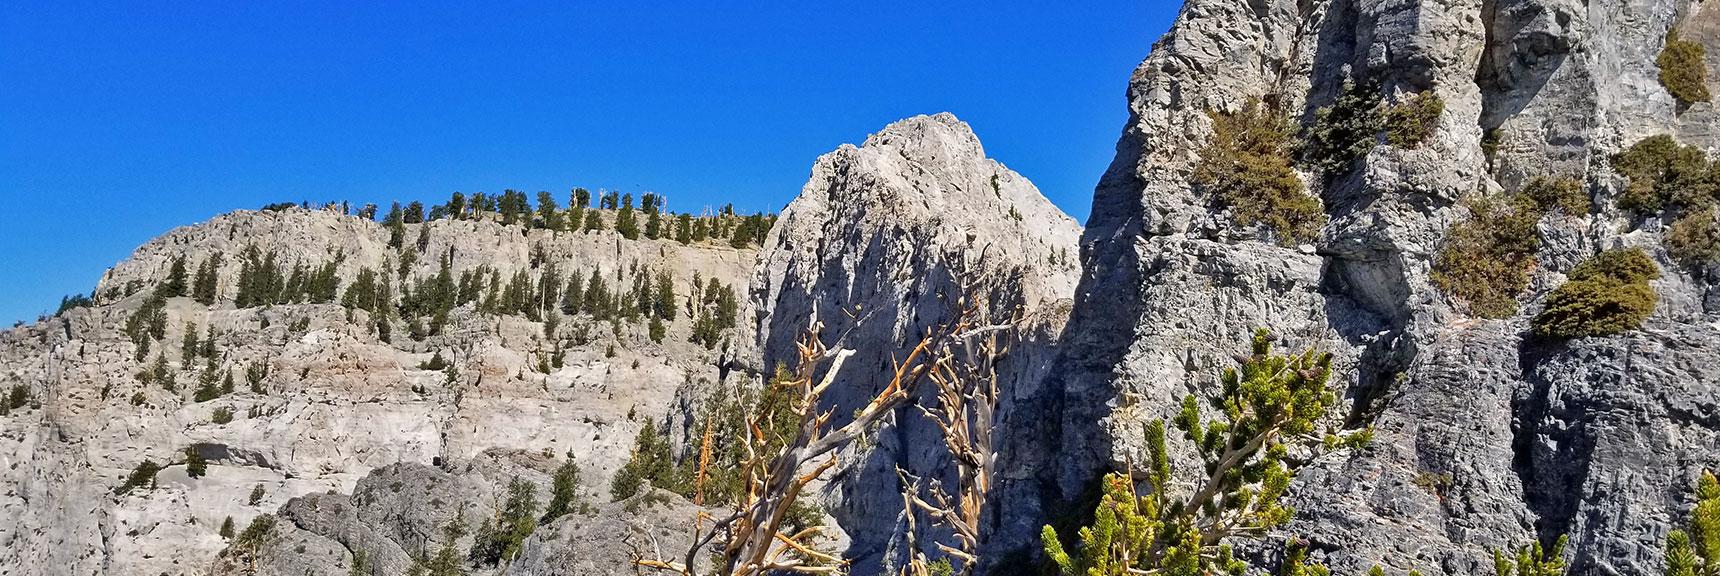 Mummy Mountain Cliffs Viewed from Mummy's Knees | Mummy Mountain's Knees | Mt. Charleston Wilderness, Nevada 021